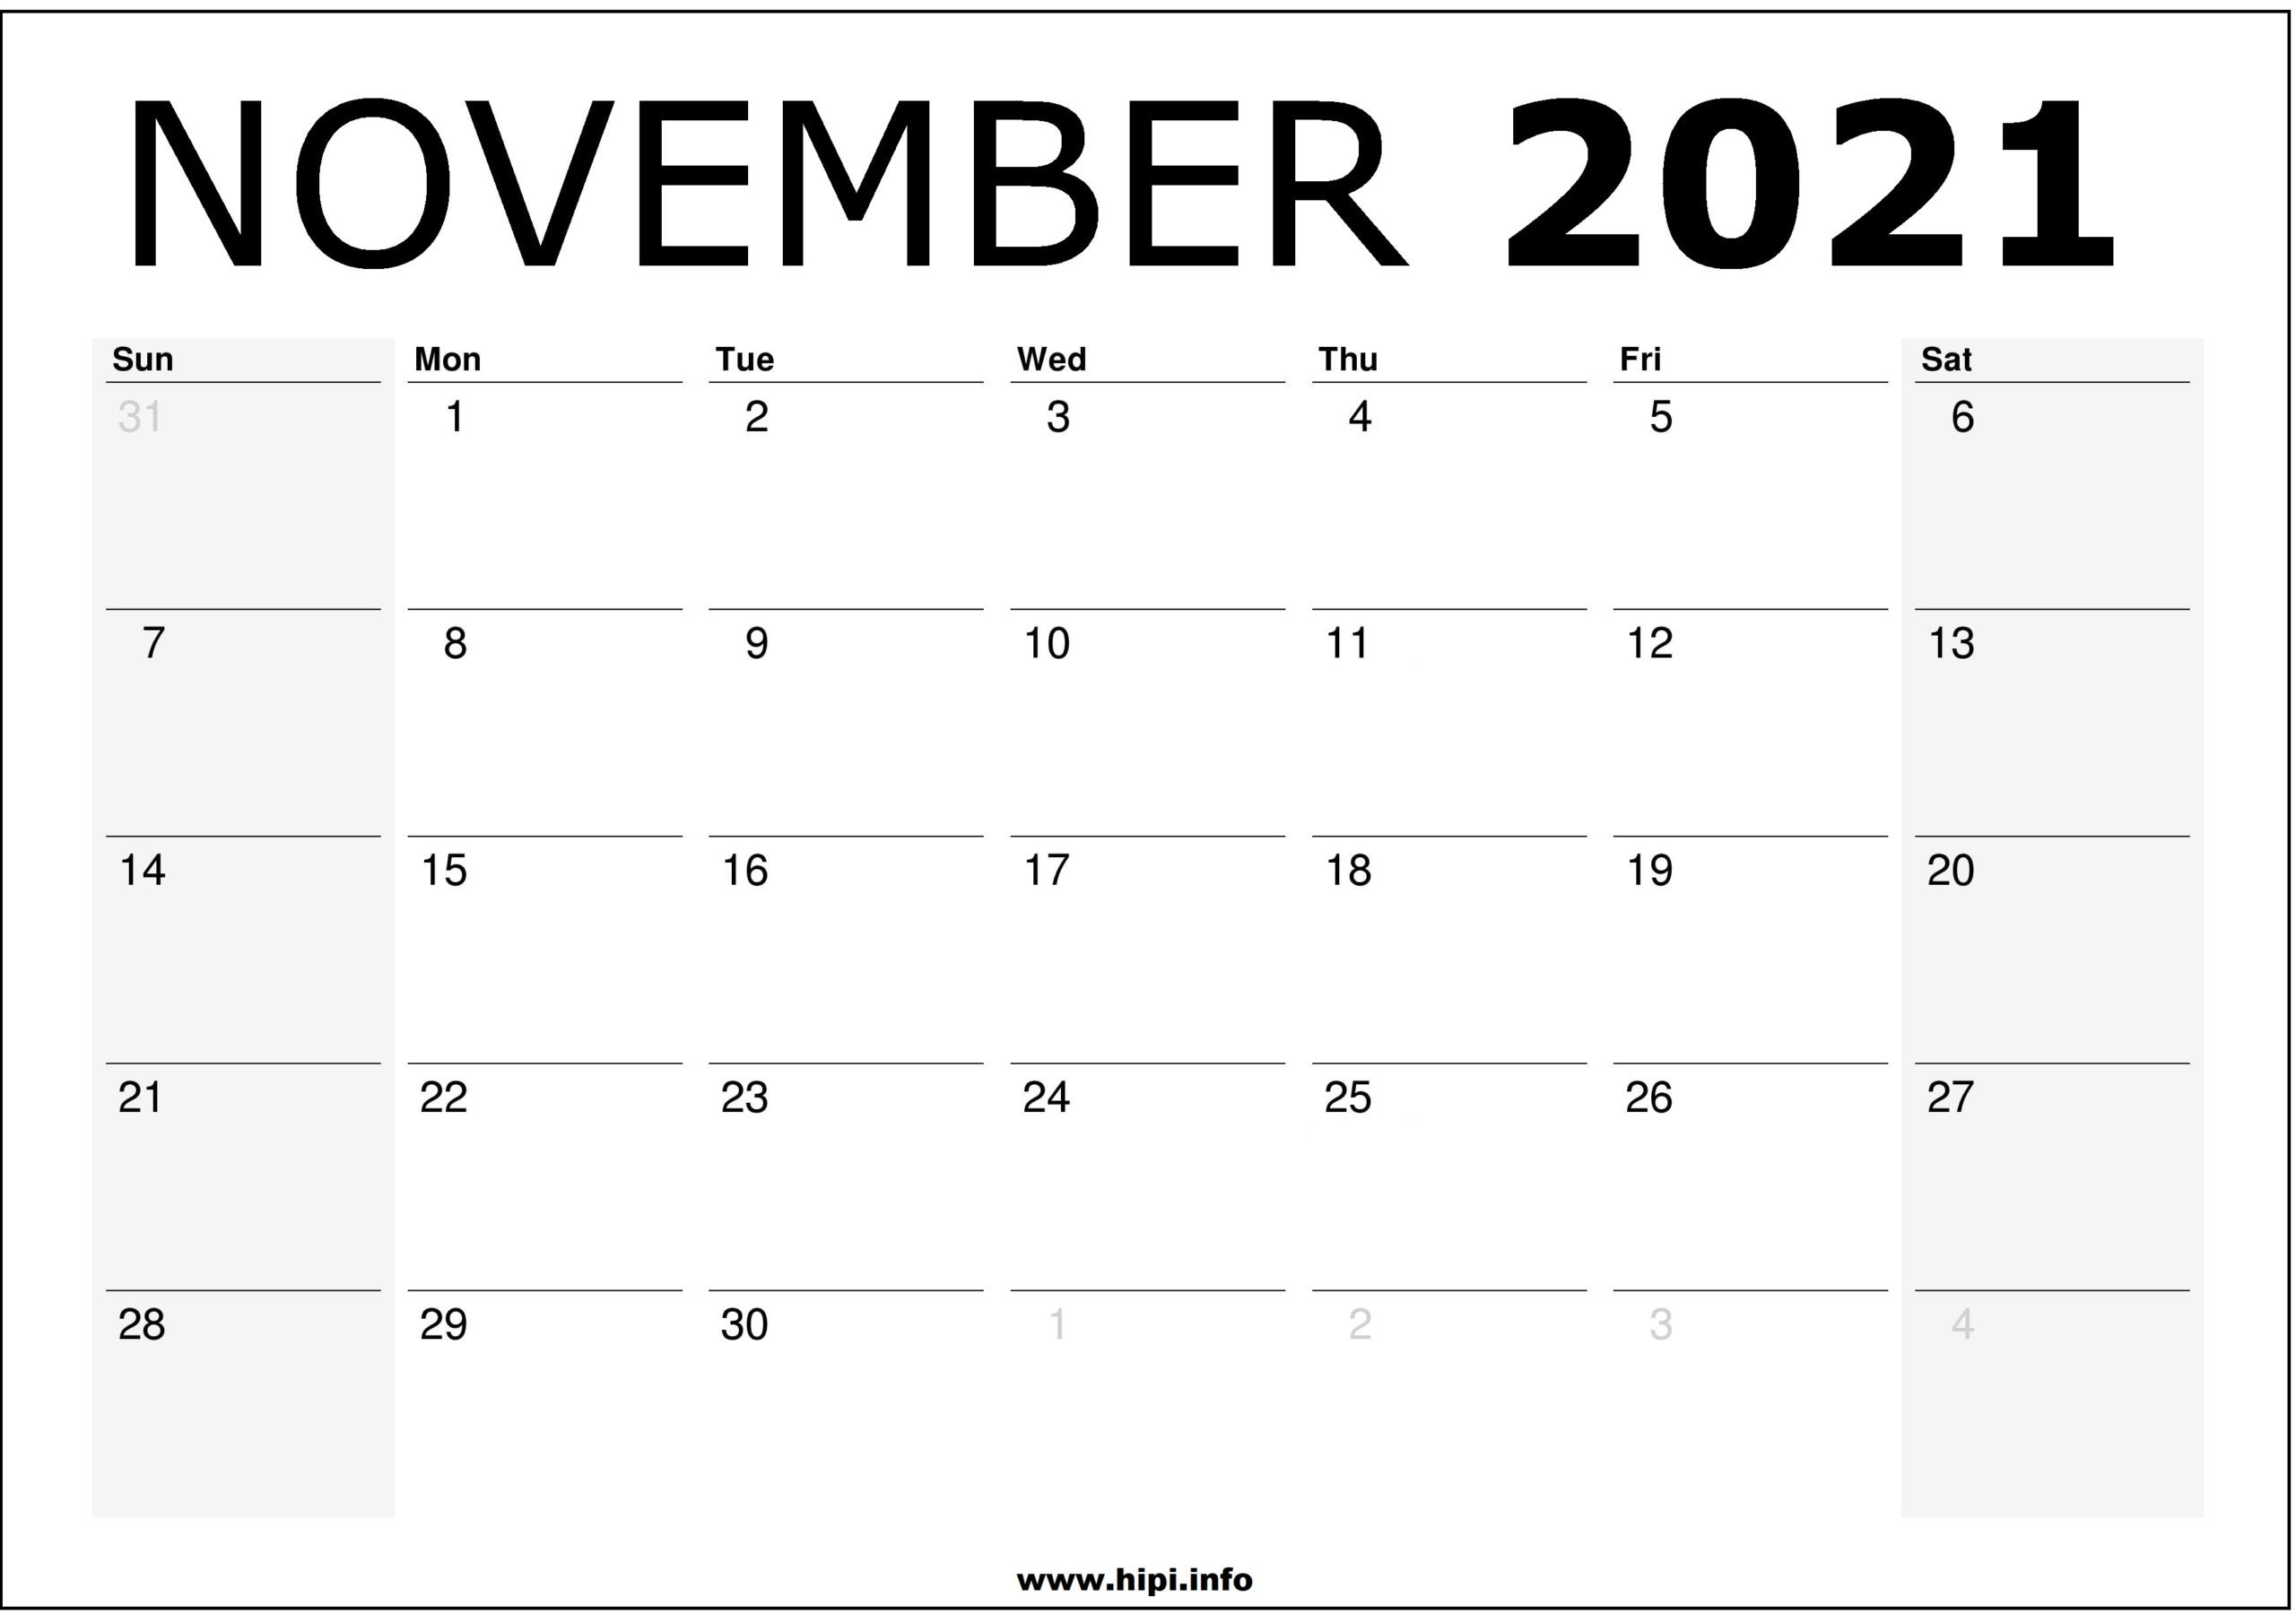 November 2021 Calendar Printable - Monthly Calendar Free Download - Hipi | Calendars throughout Free Printable Calendars 2021 Monthly